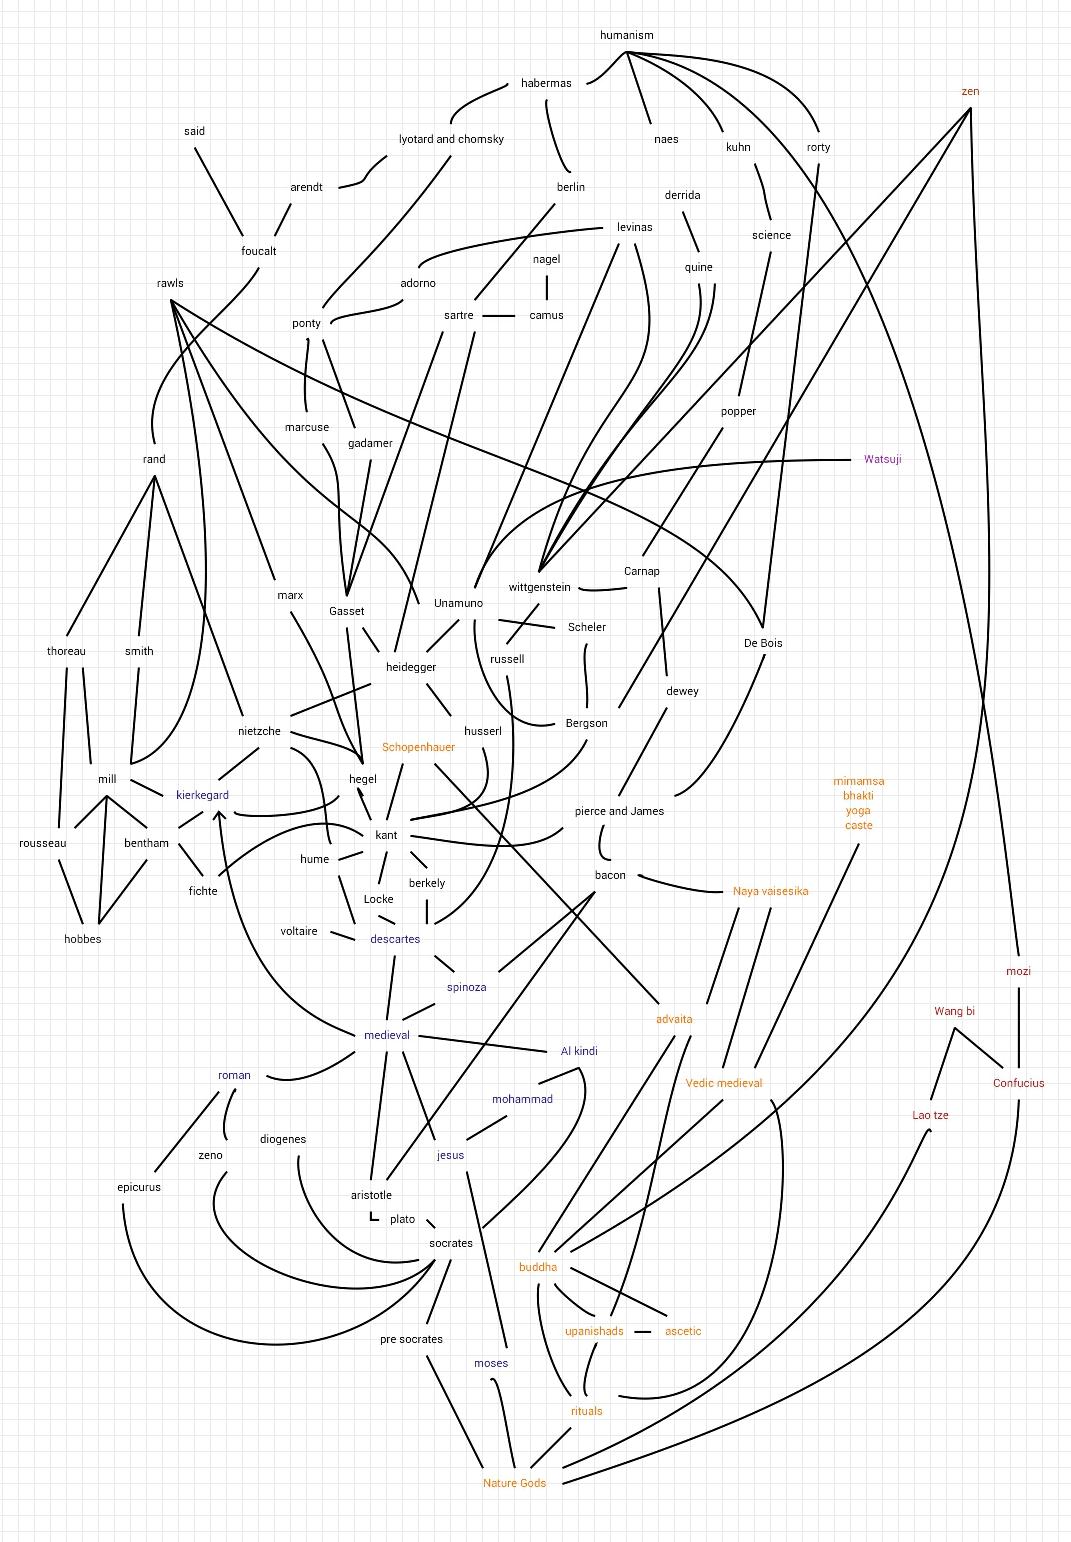 2014-12-24-18-34-22[1]